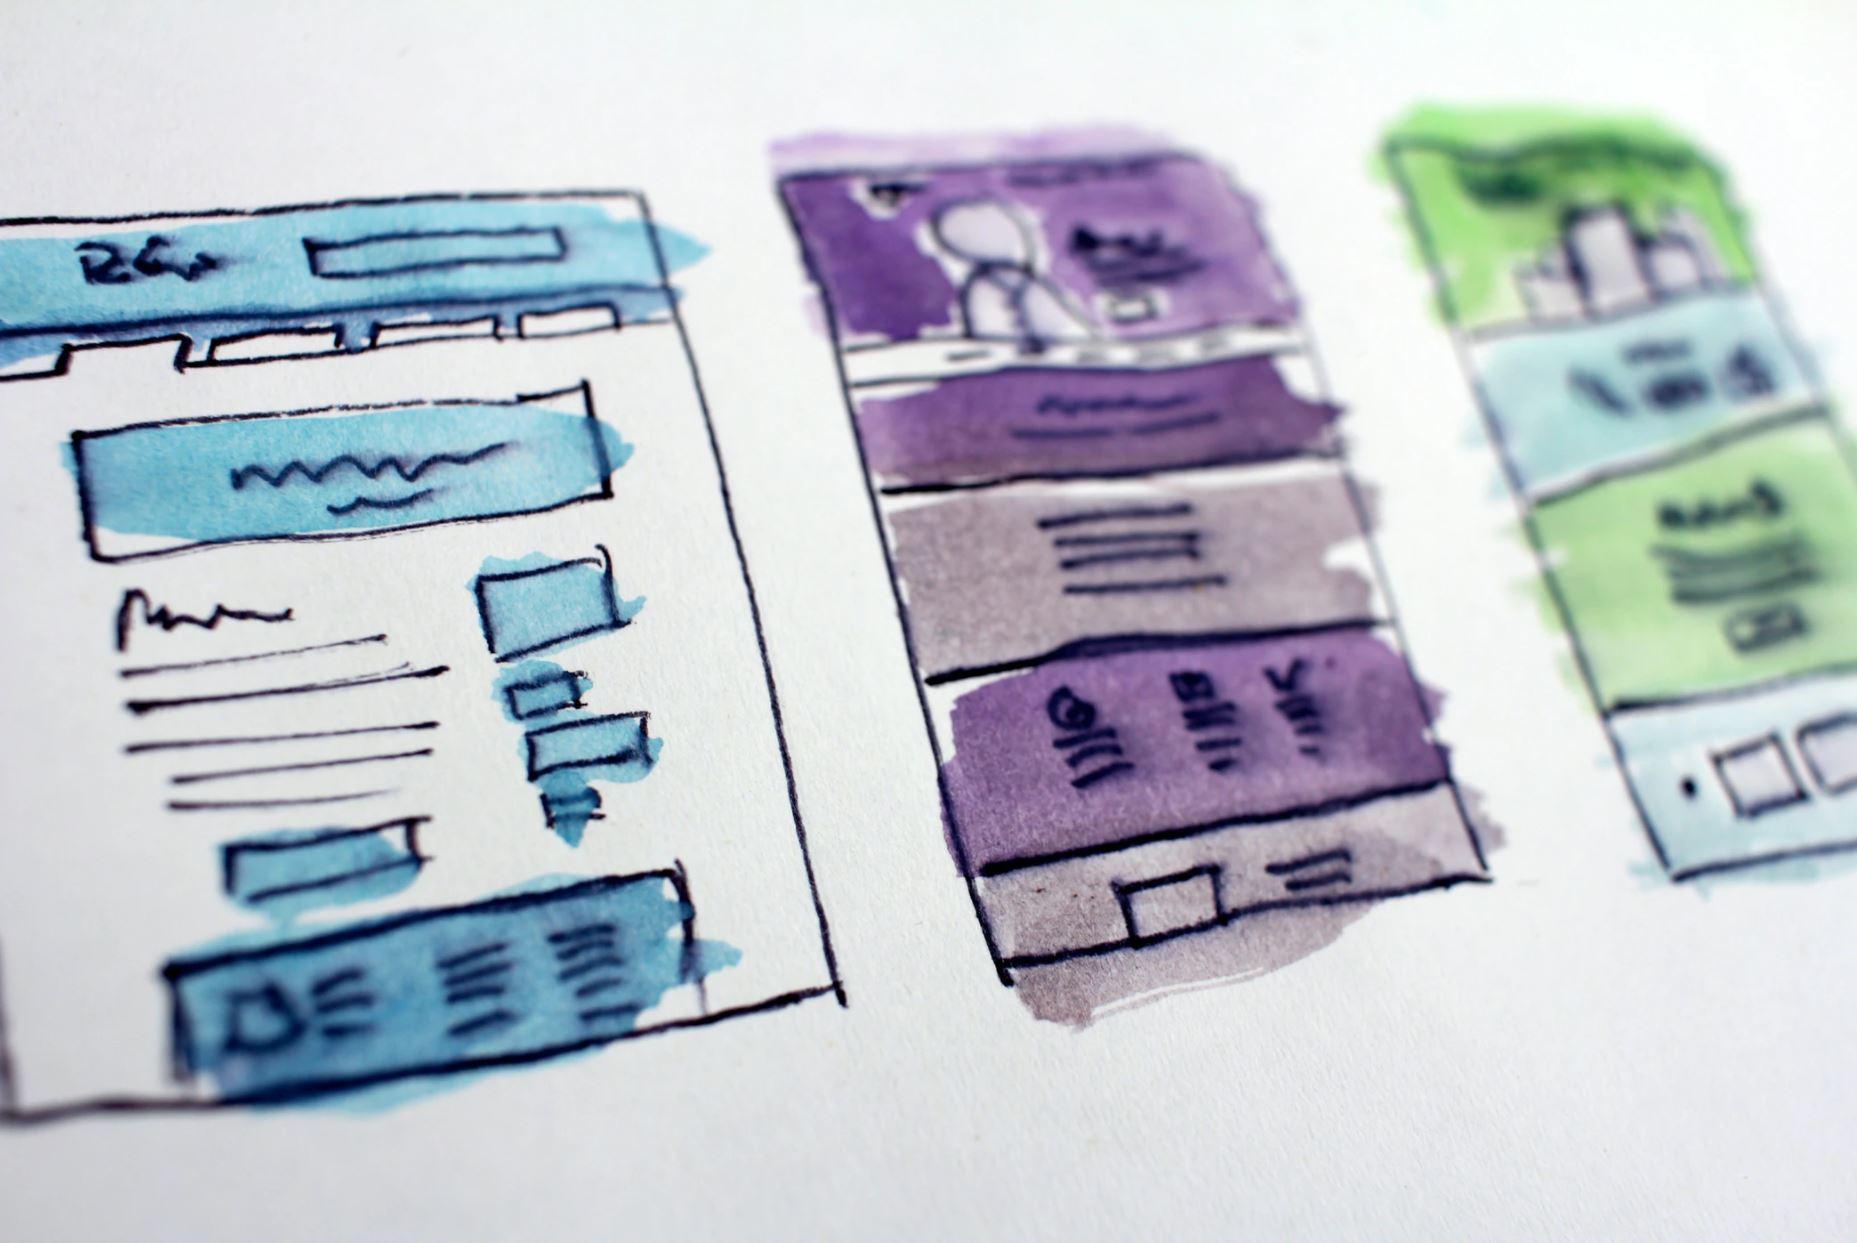 design thinking: prototype